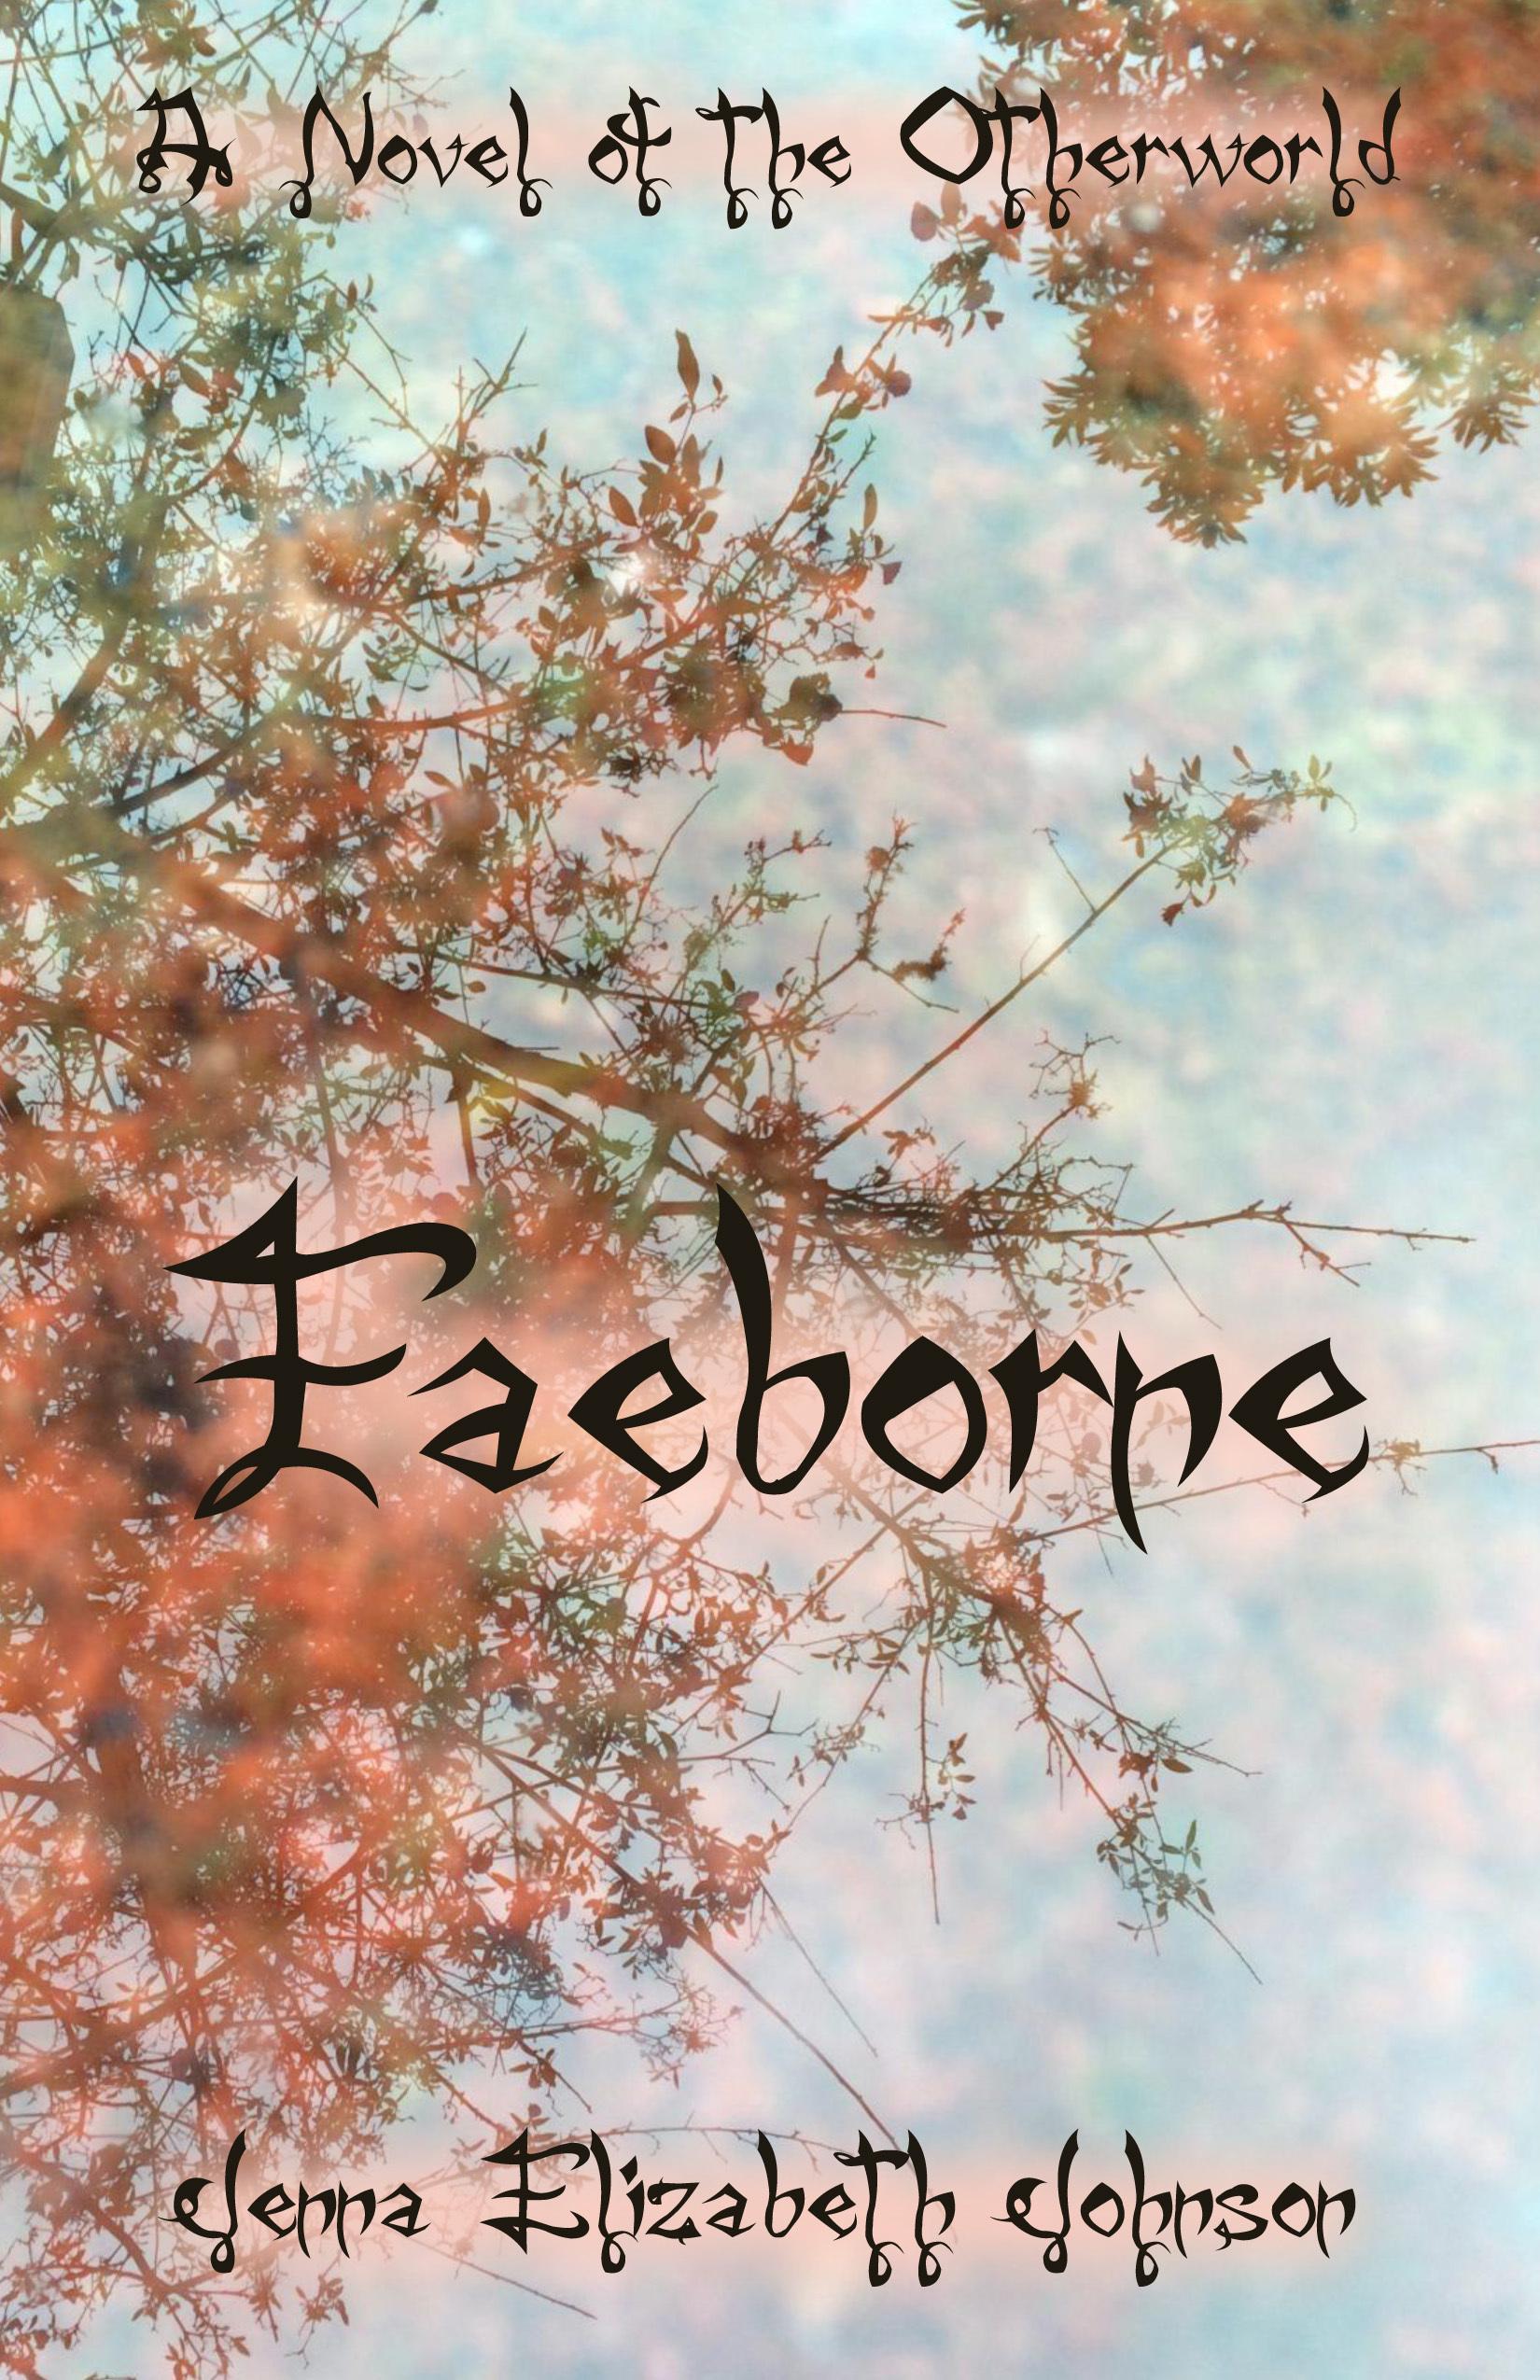 Faeborne - A Novel of the Otherworld (Otherworld, #9)  by  Jenna Elizabeth Johnson